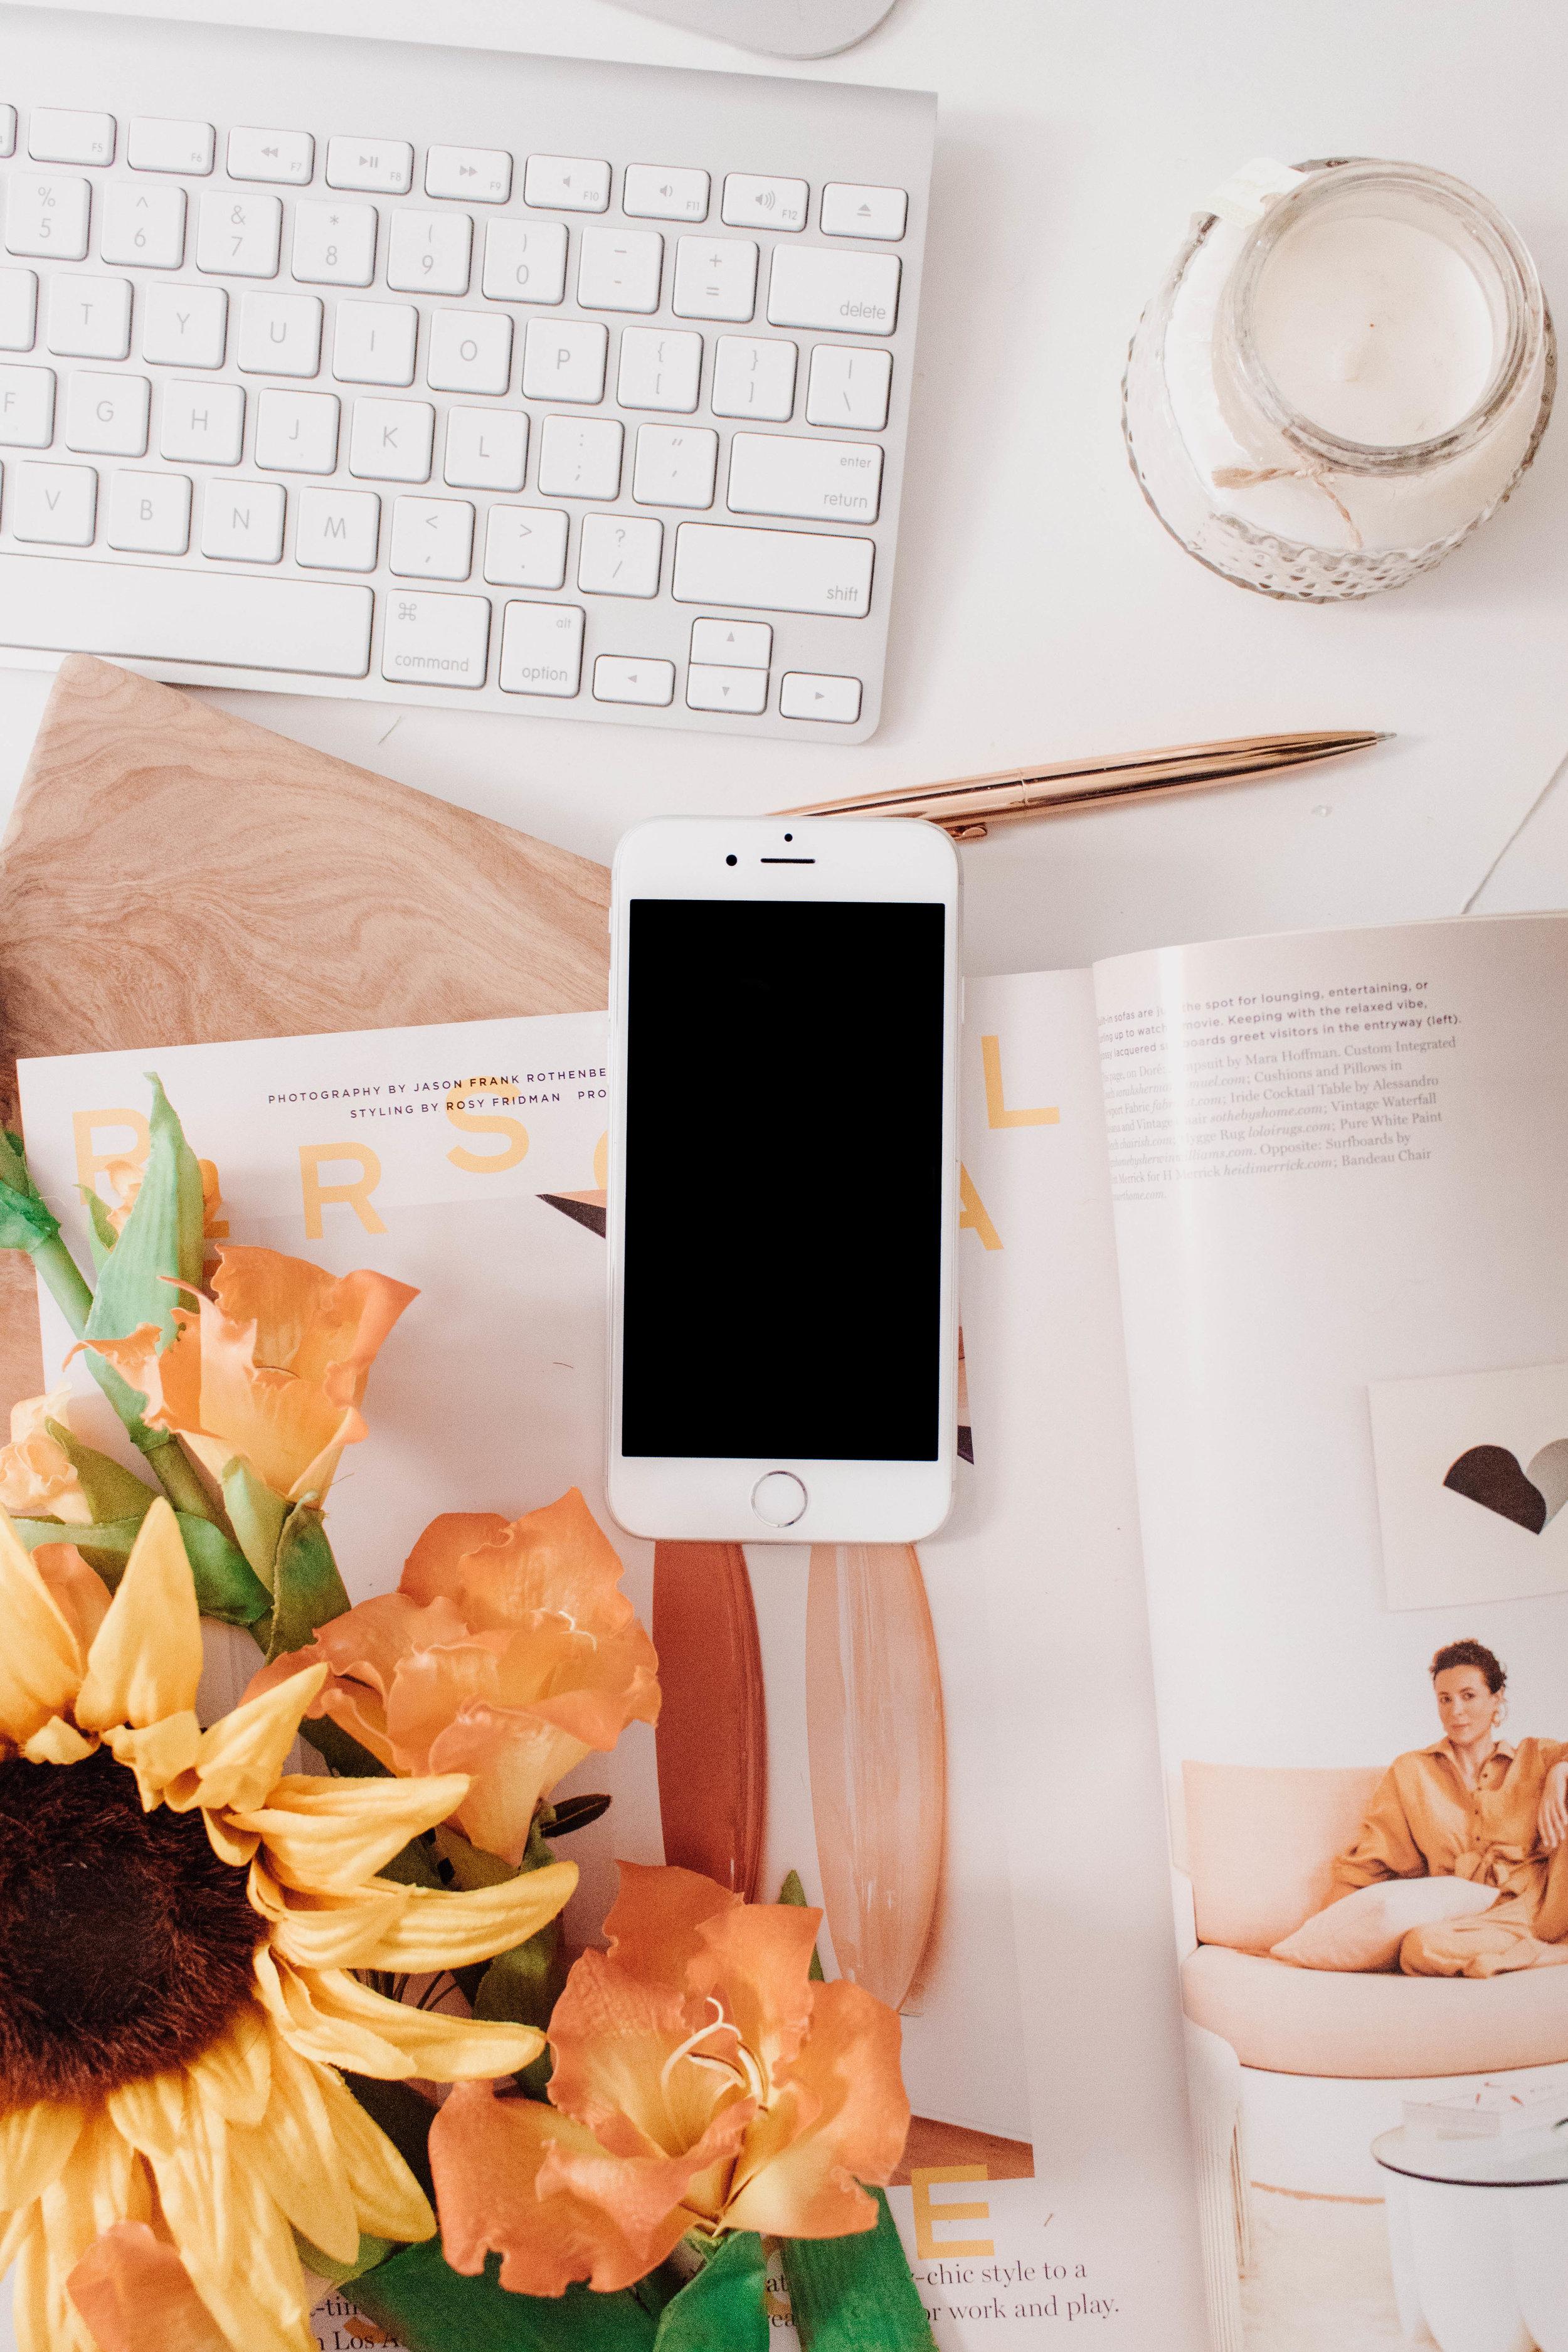 sunflower phone.jpg